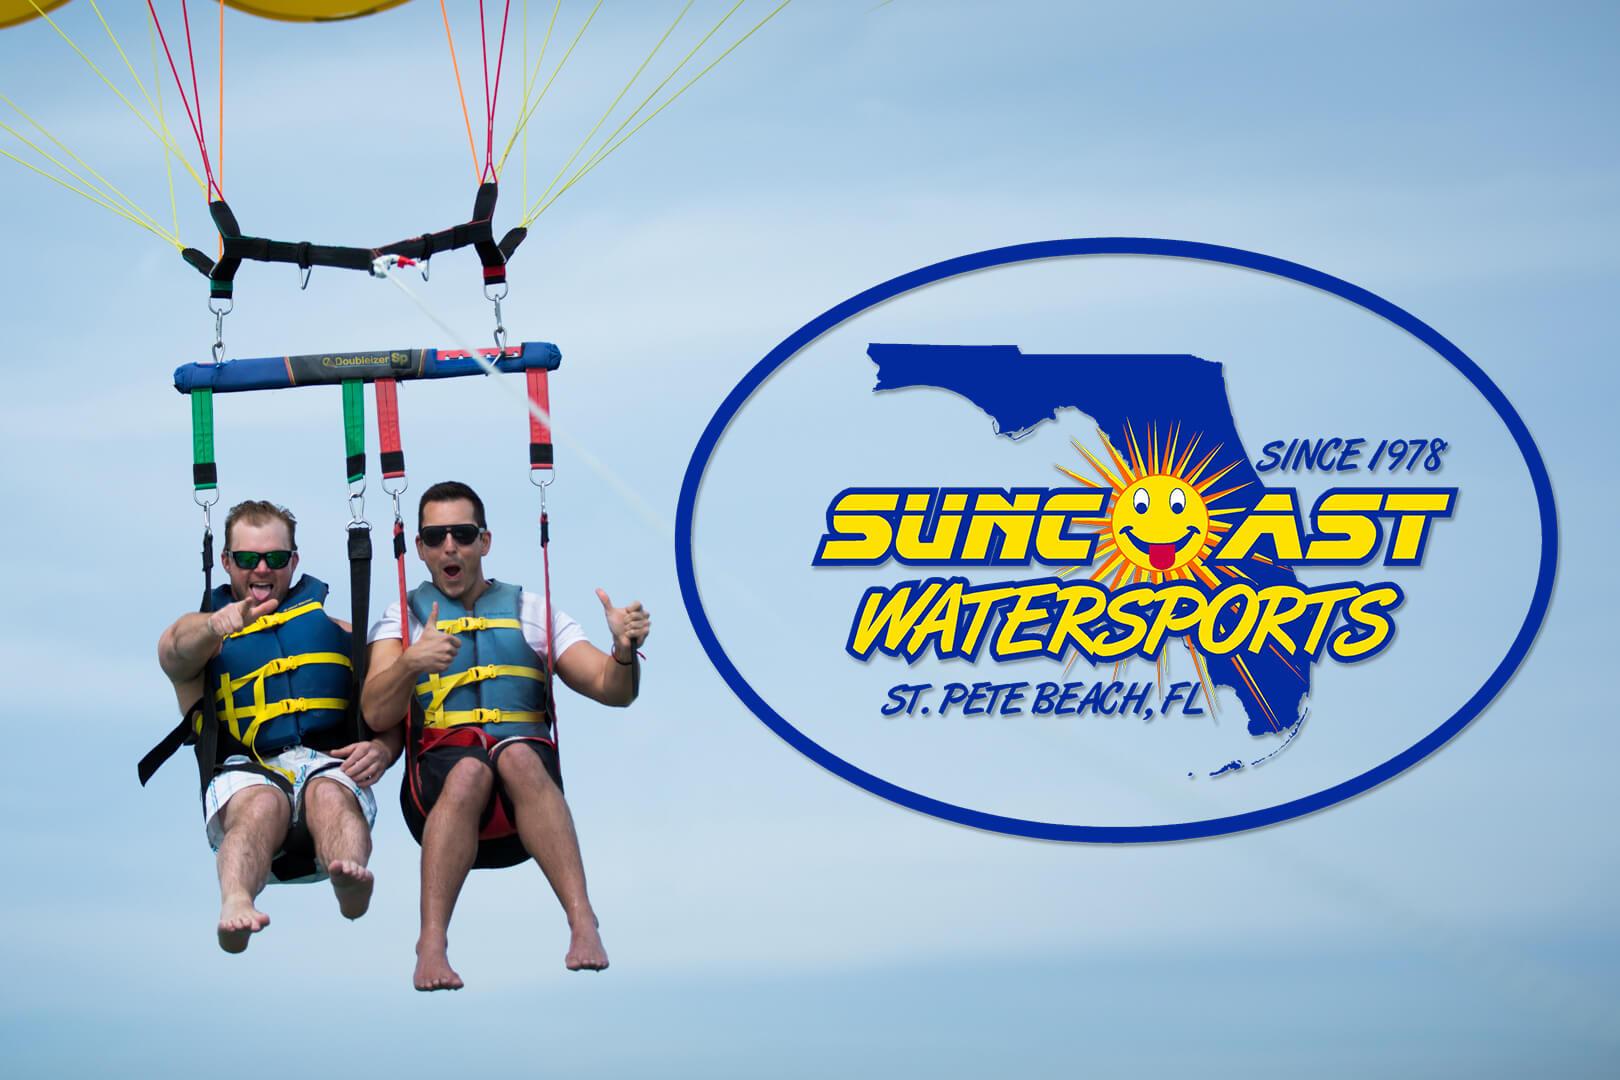 suncoast-watersports.jpg